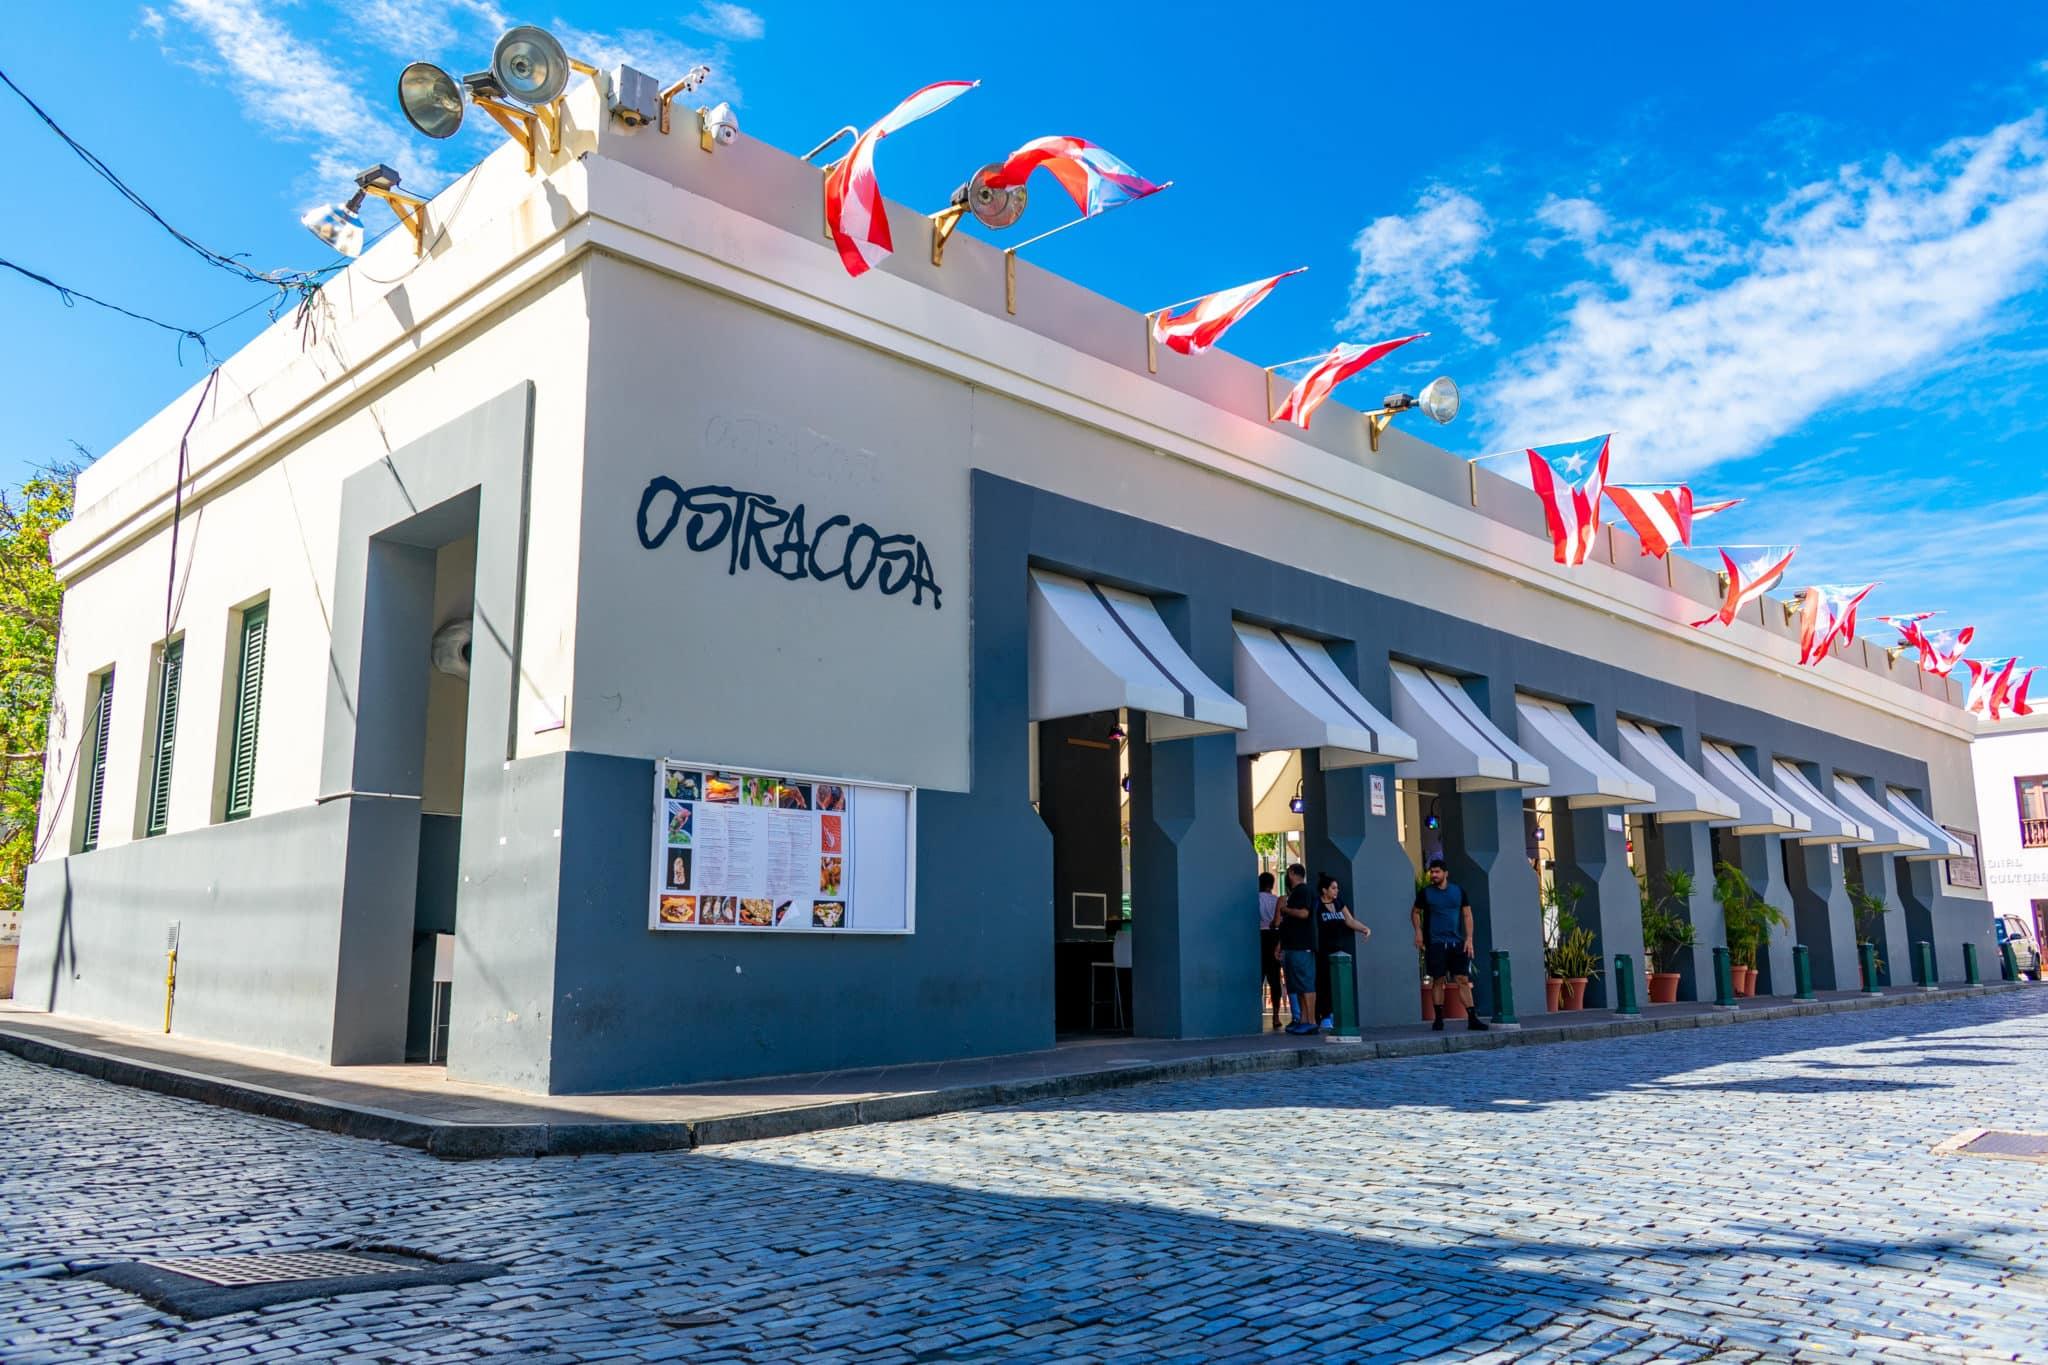 Ostra Cosa in Old San Juan: Taste of the Caribbean